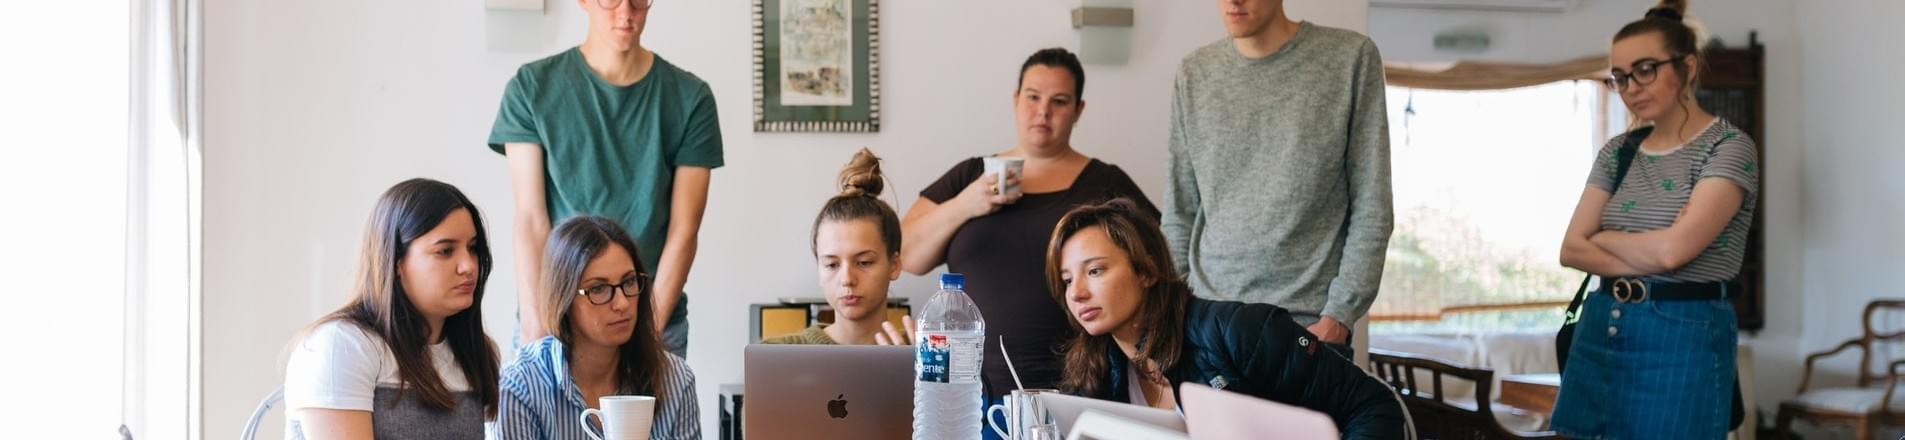 Eversheds: Female representation in boardrooms